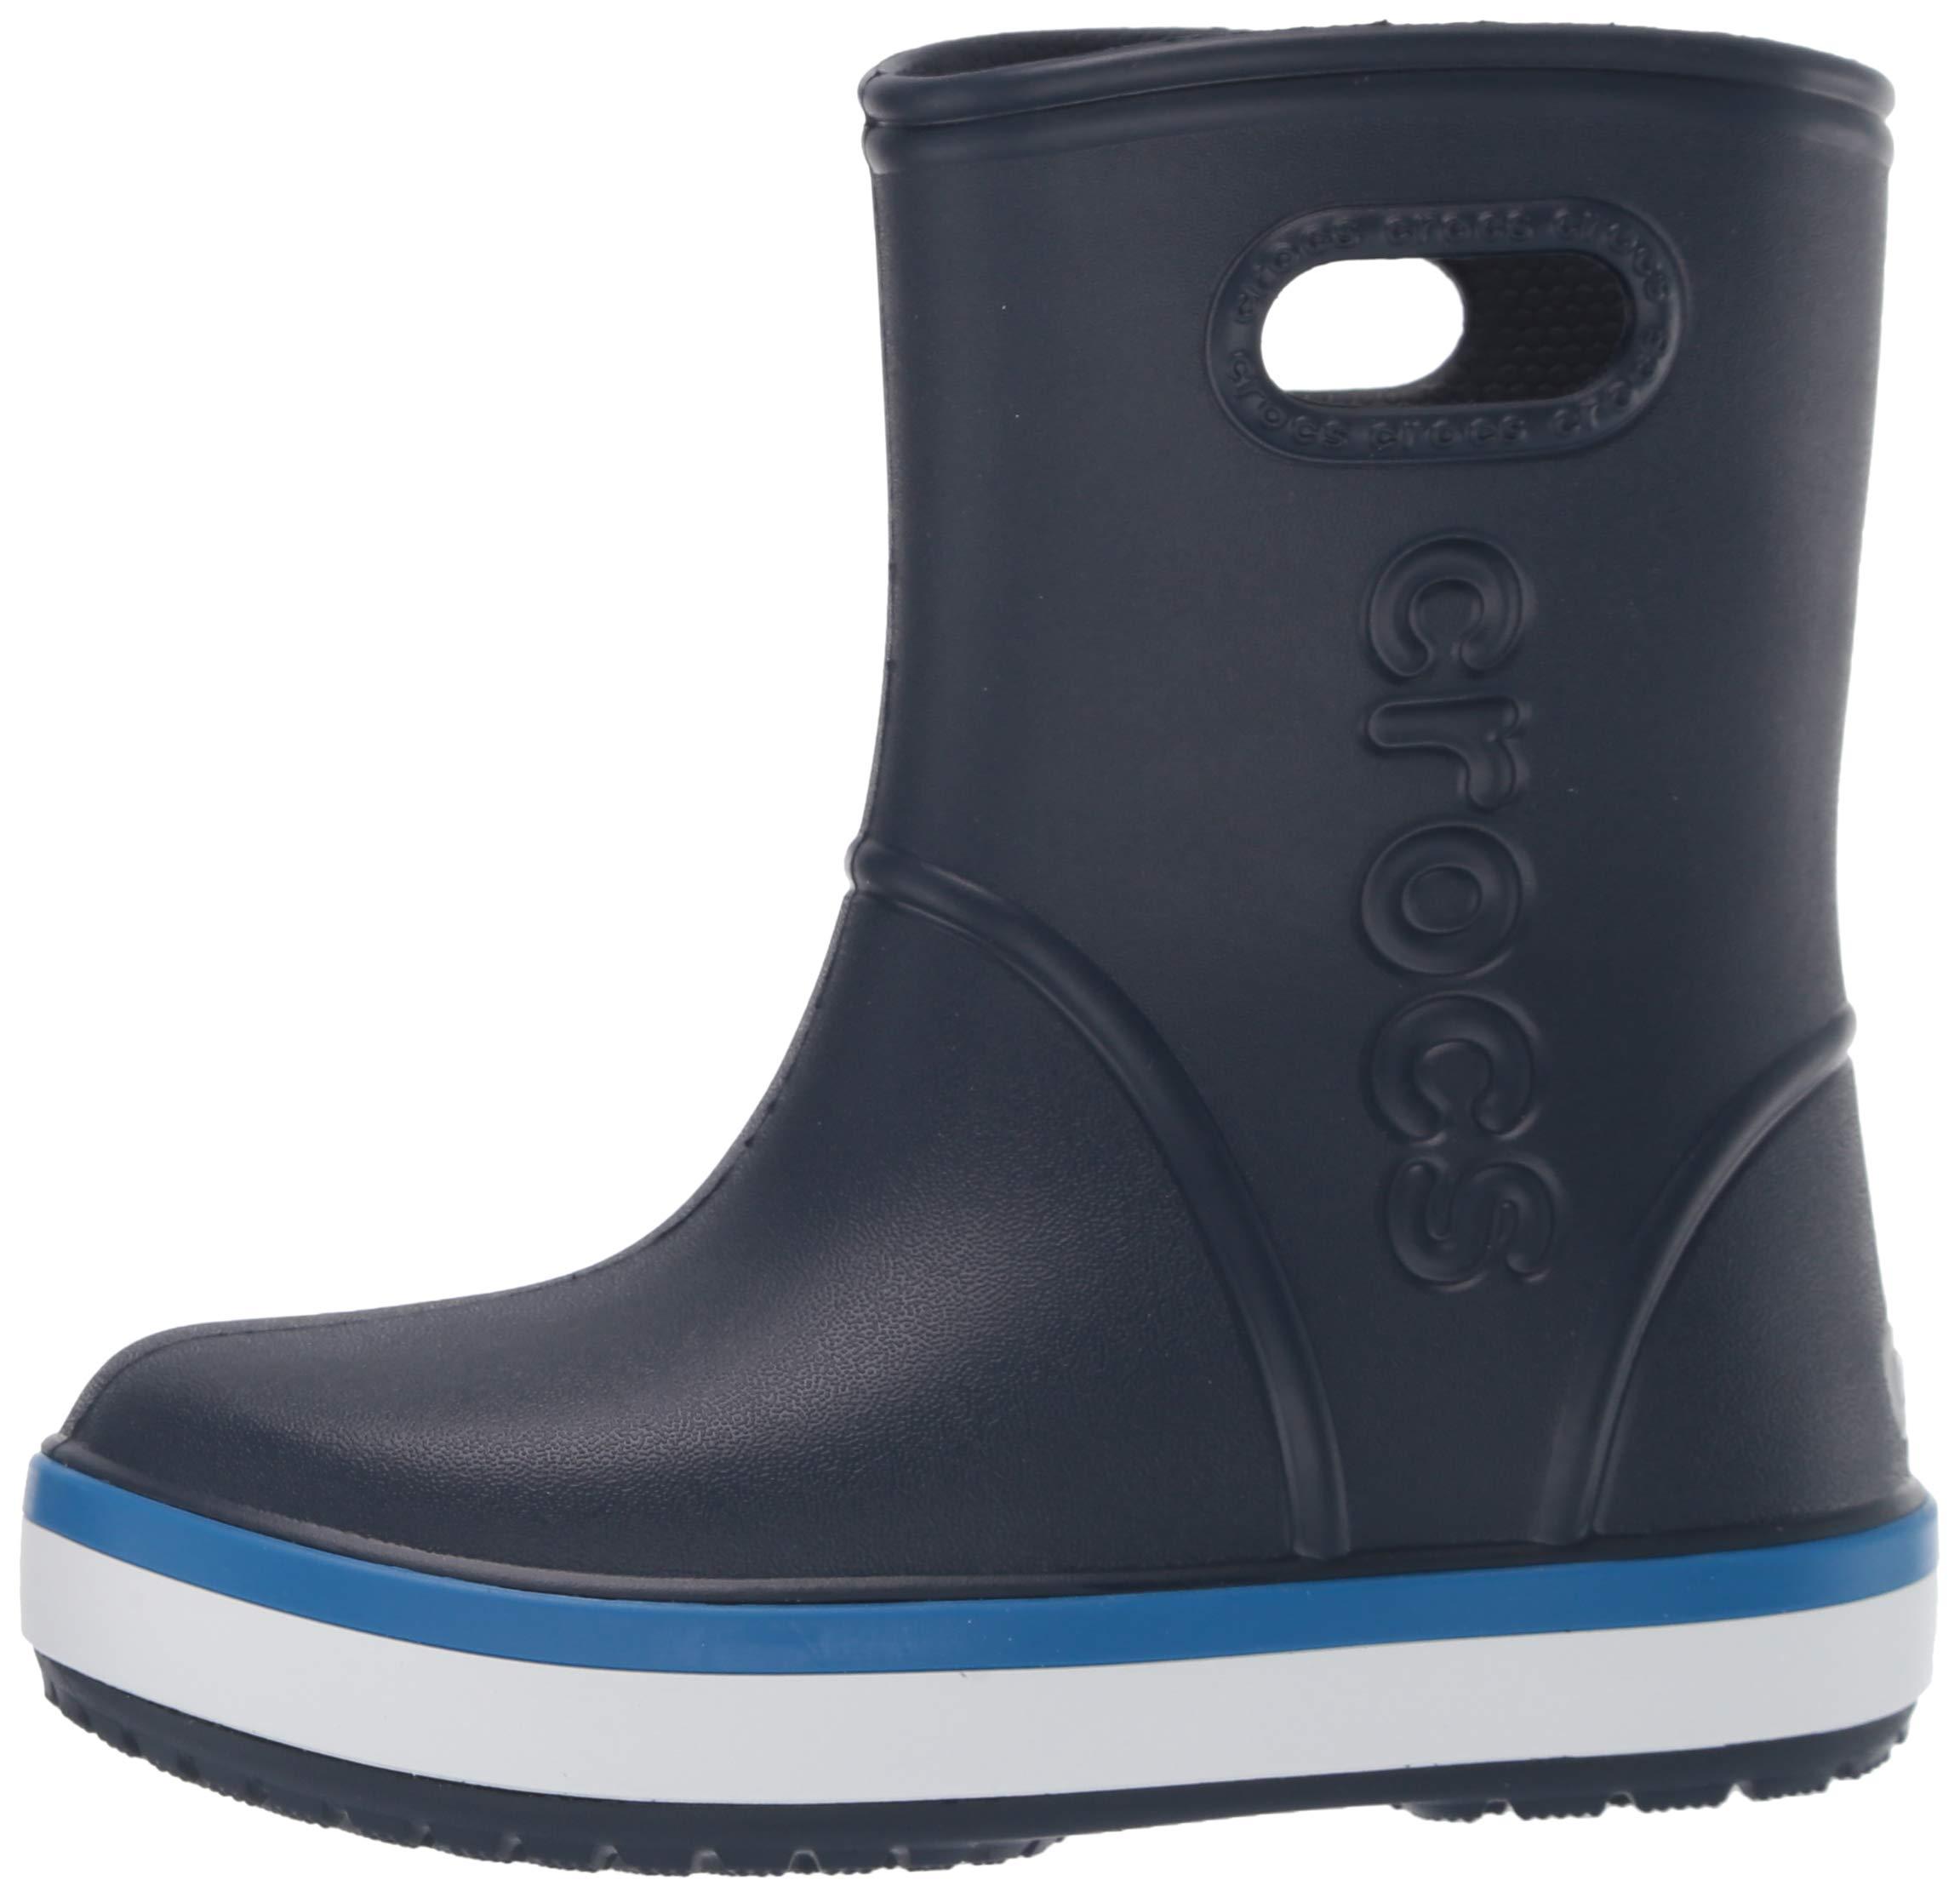 Crocs Unisex Crocband Rain Boot, Navy/Bright Cobalt, 2 M US Little Kid by Crocs (Image #5)